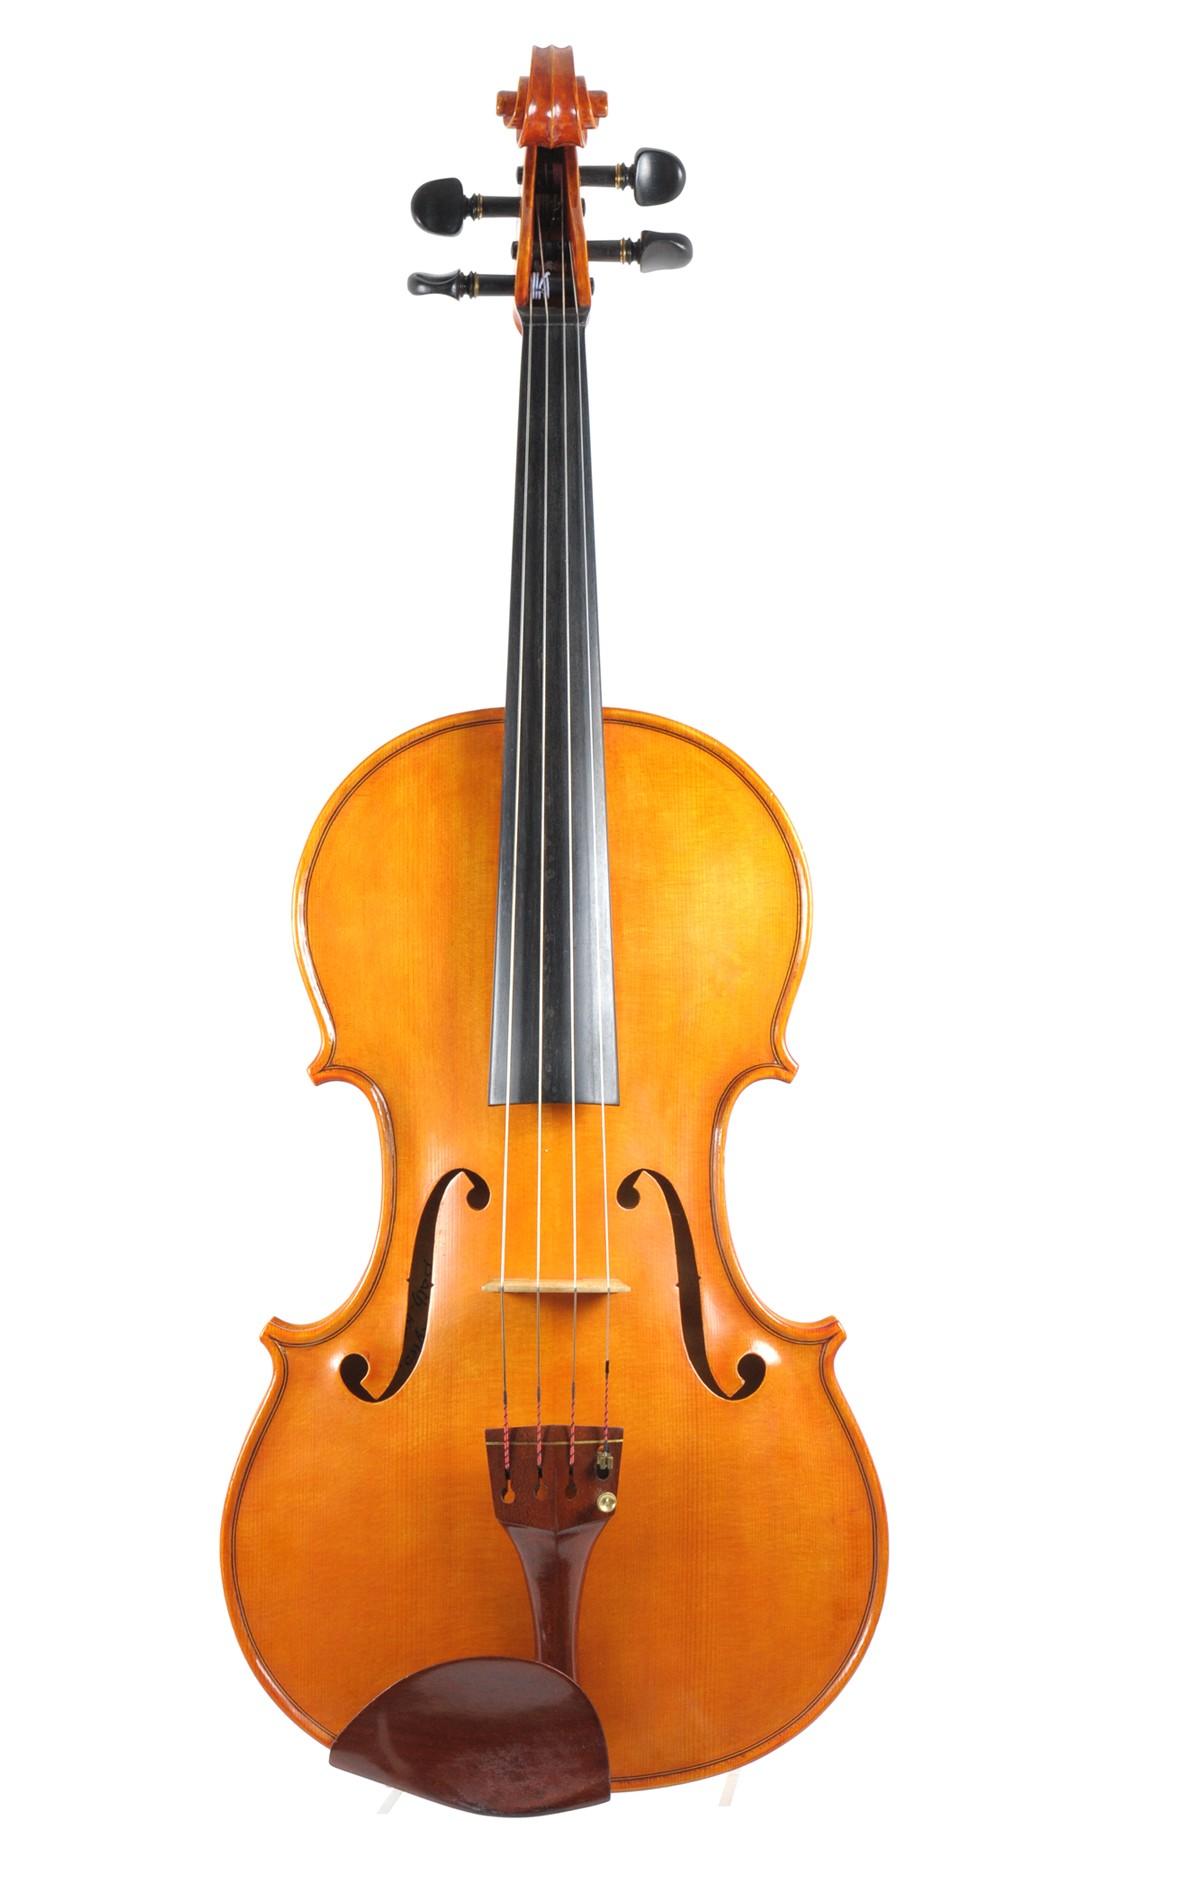 Older English viola by Harold Lester Styles